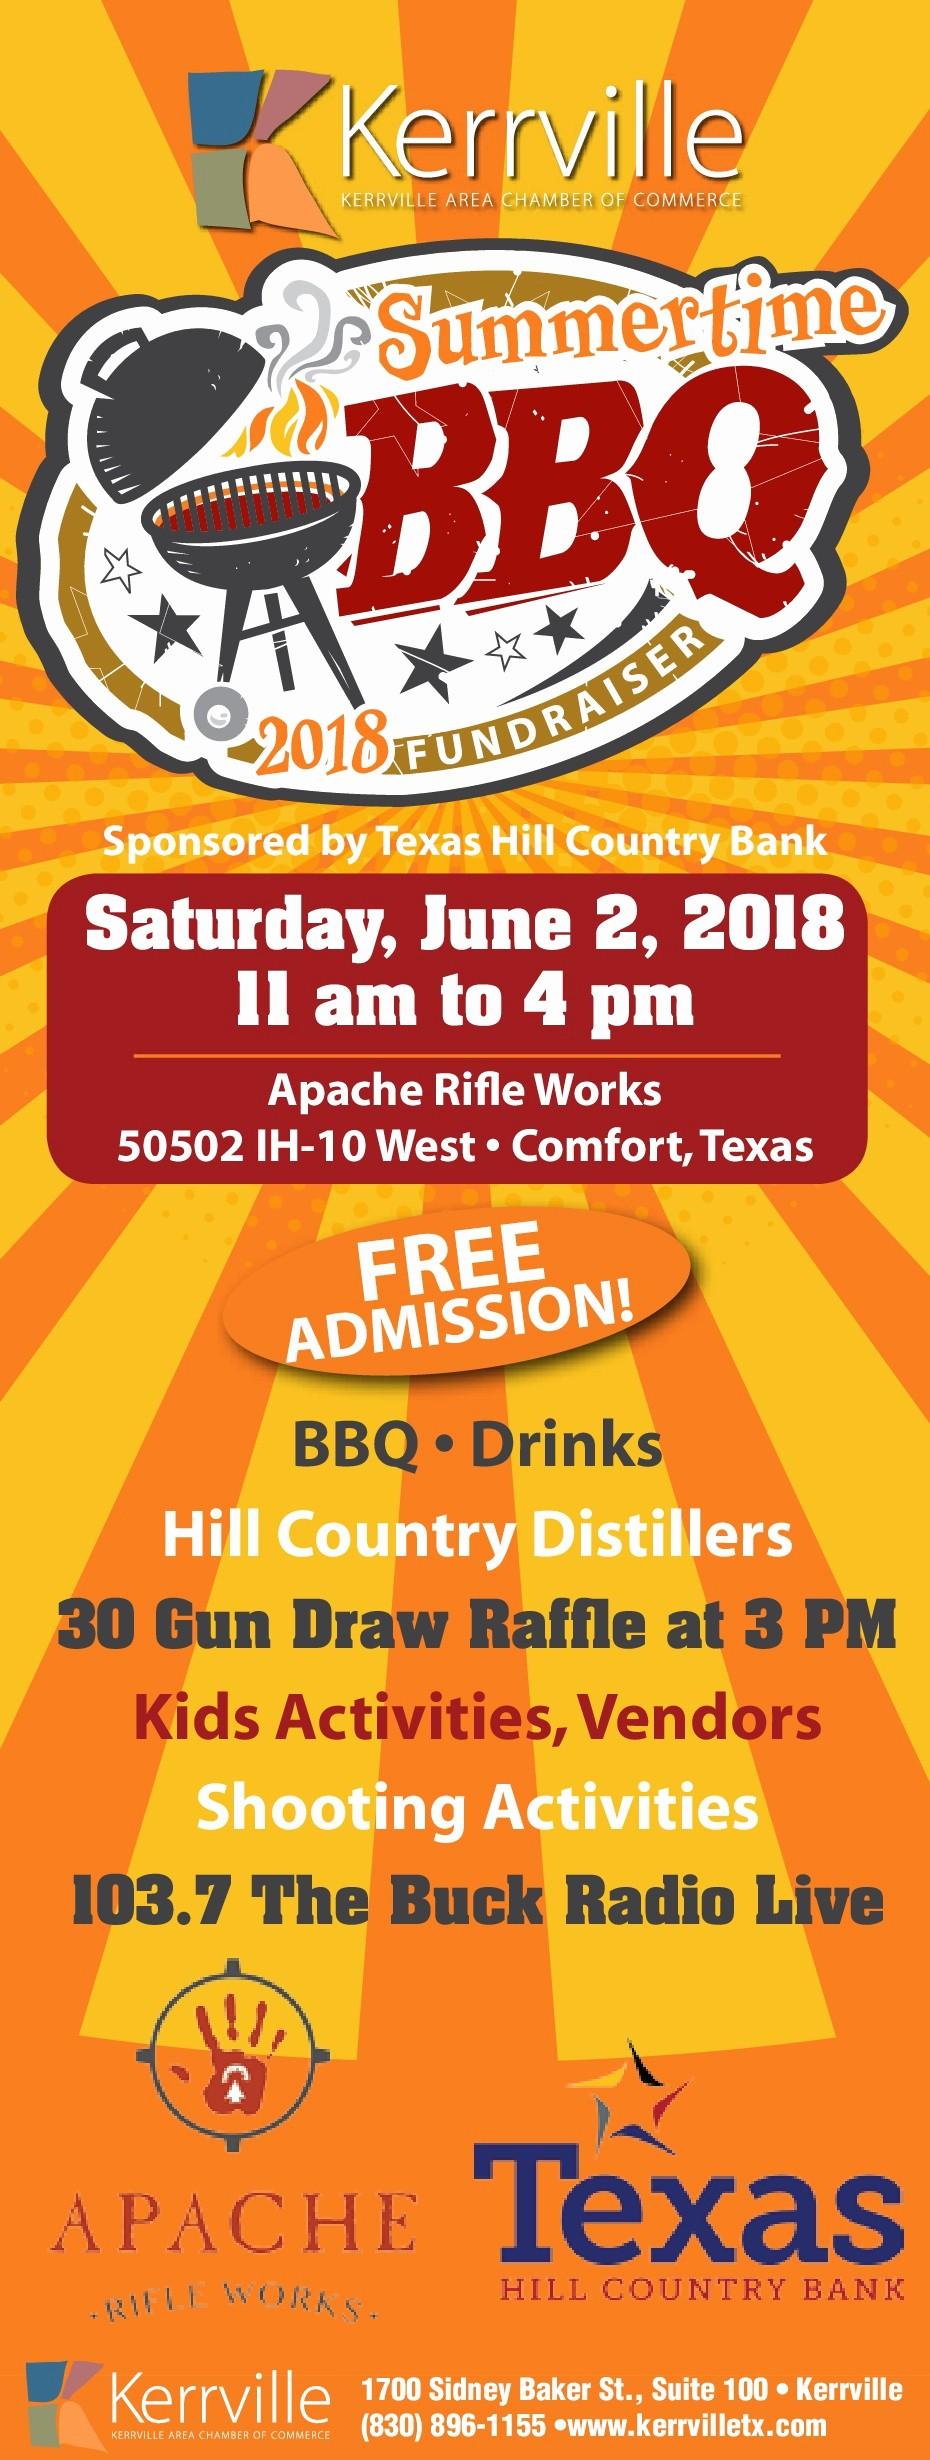 Bbq Fundraiser Flyer Templates Free Inspirational Summertime Bbq Fundraiser • Kerrville area Chamber Of Merce